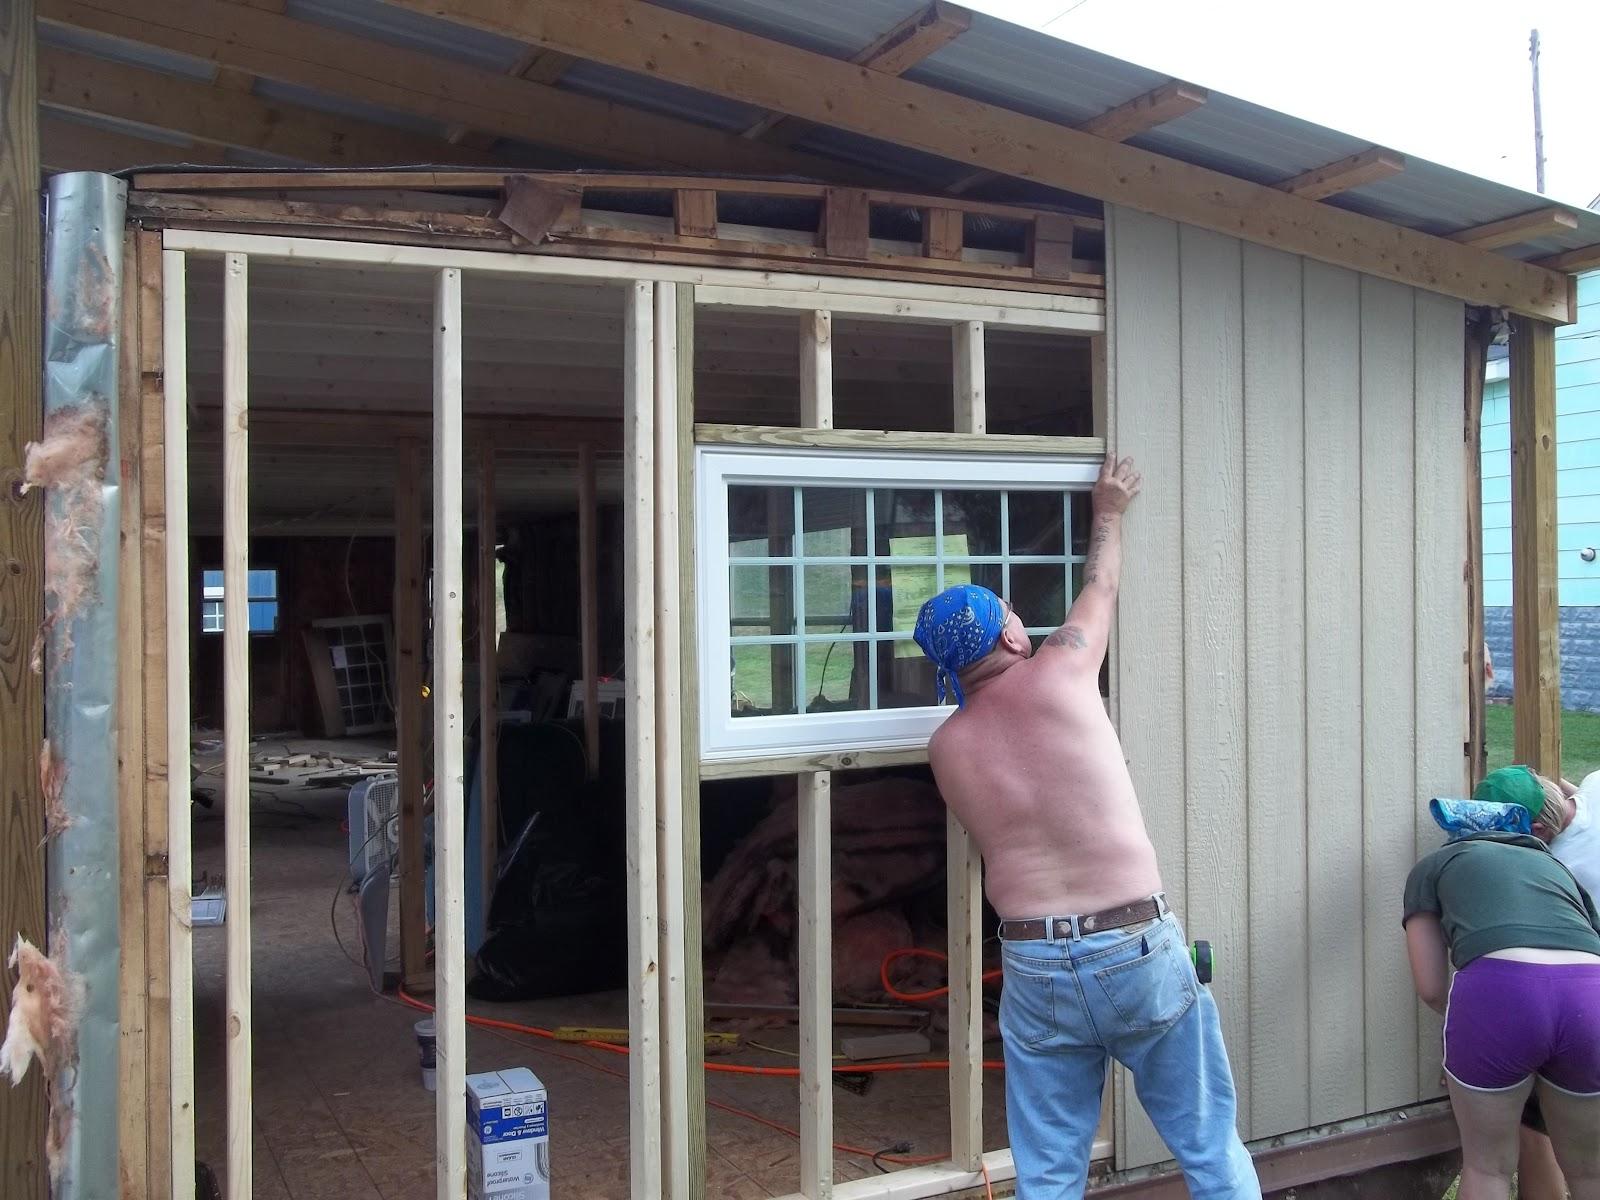 Melissa and brian 39 s great diy adventures new walls - Mobile home exterior door replacement ...